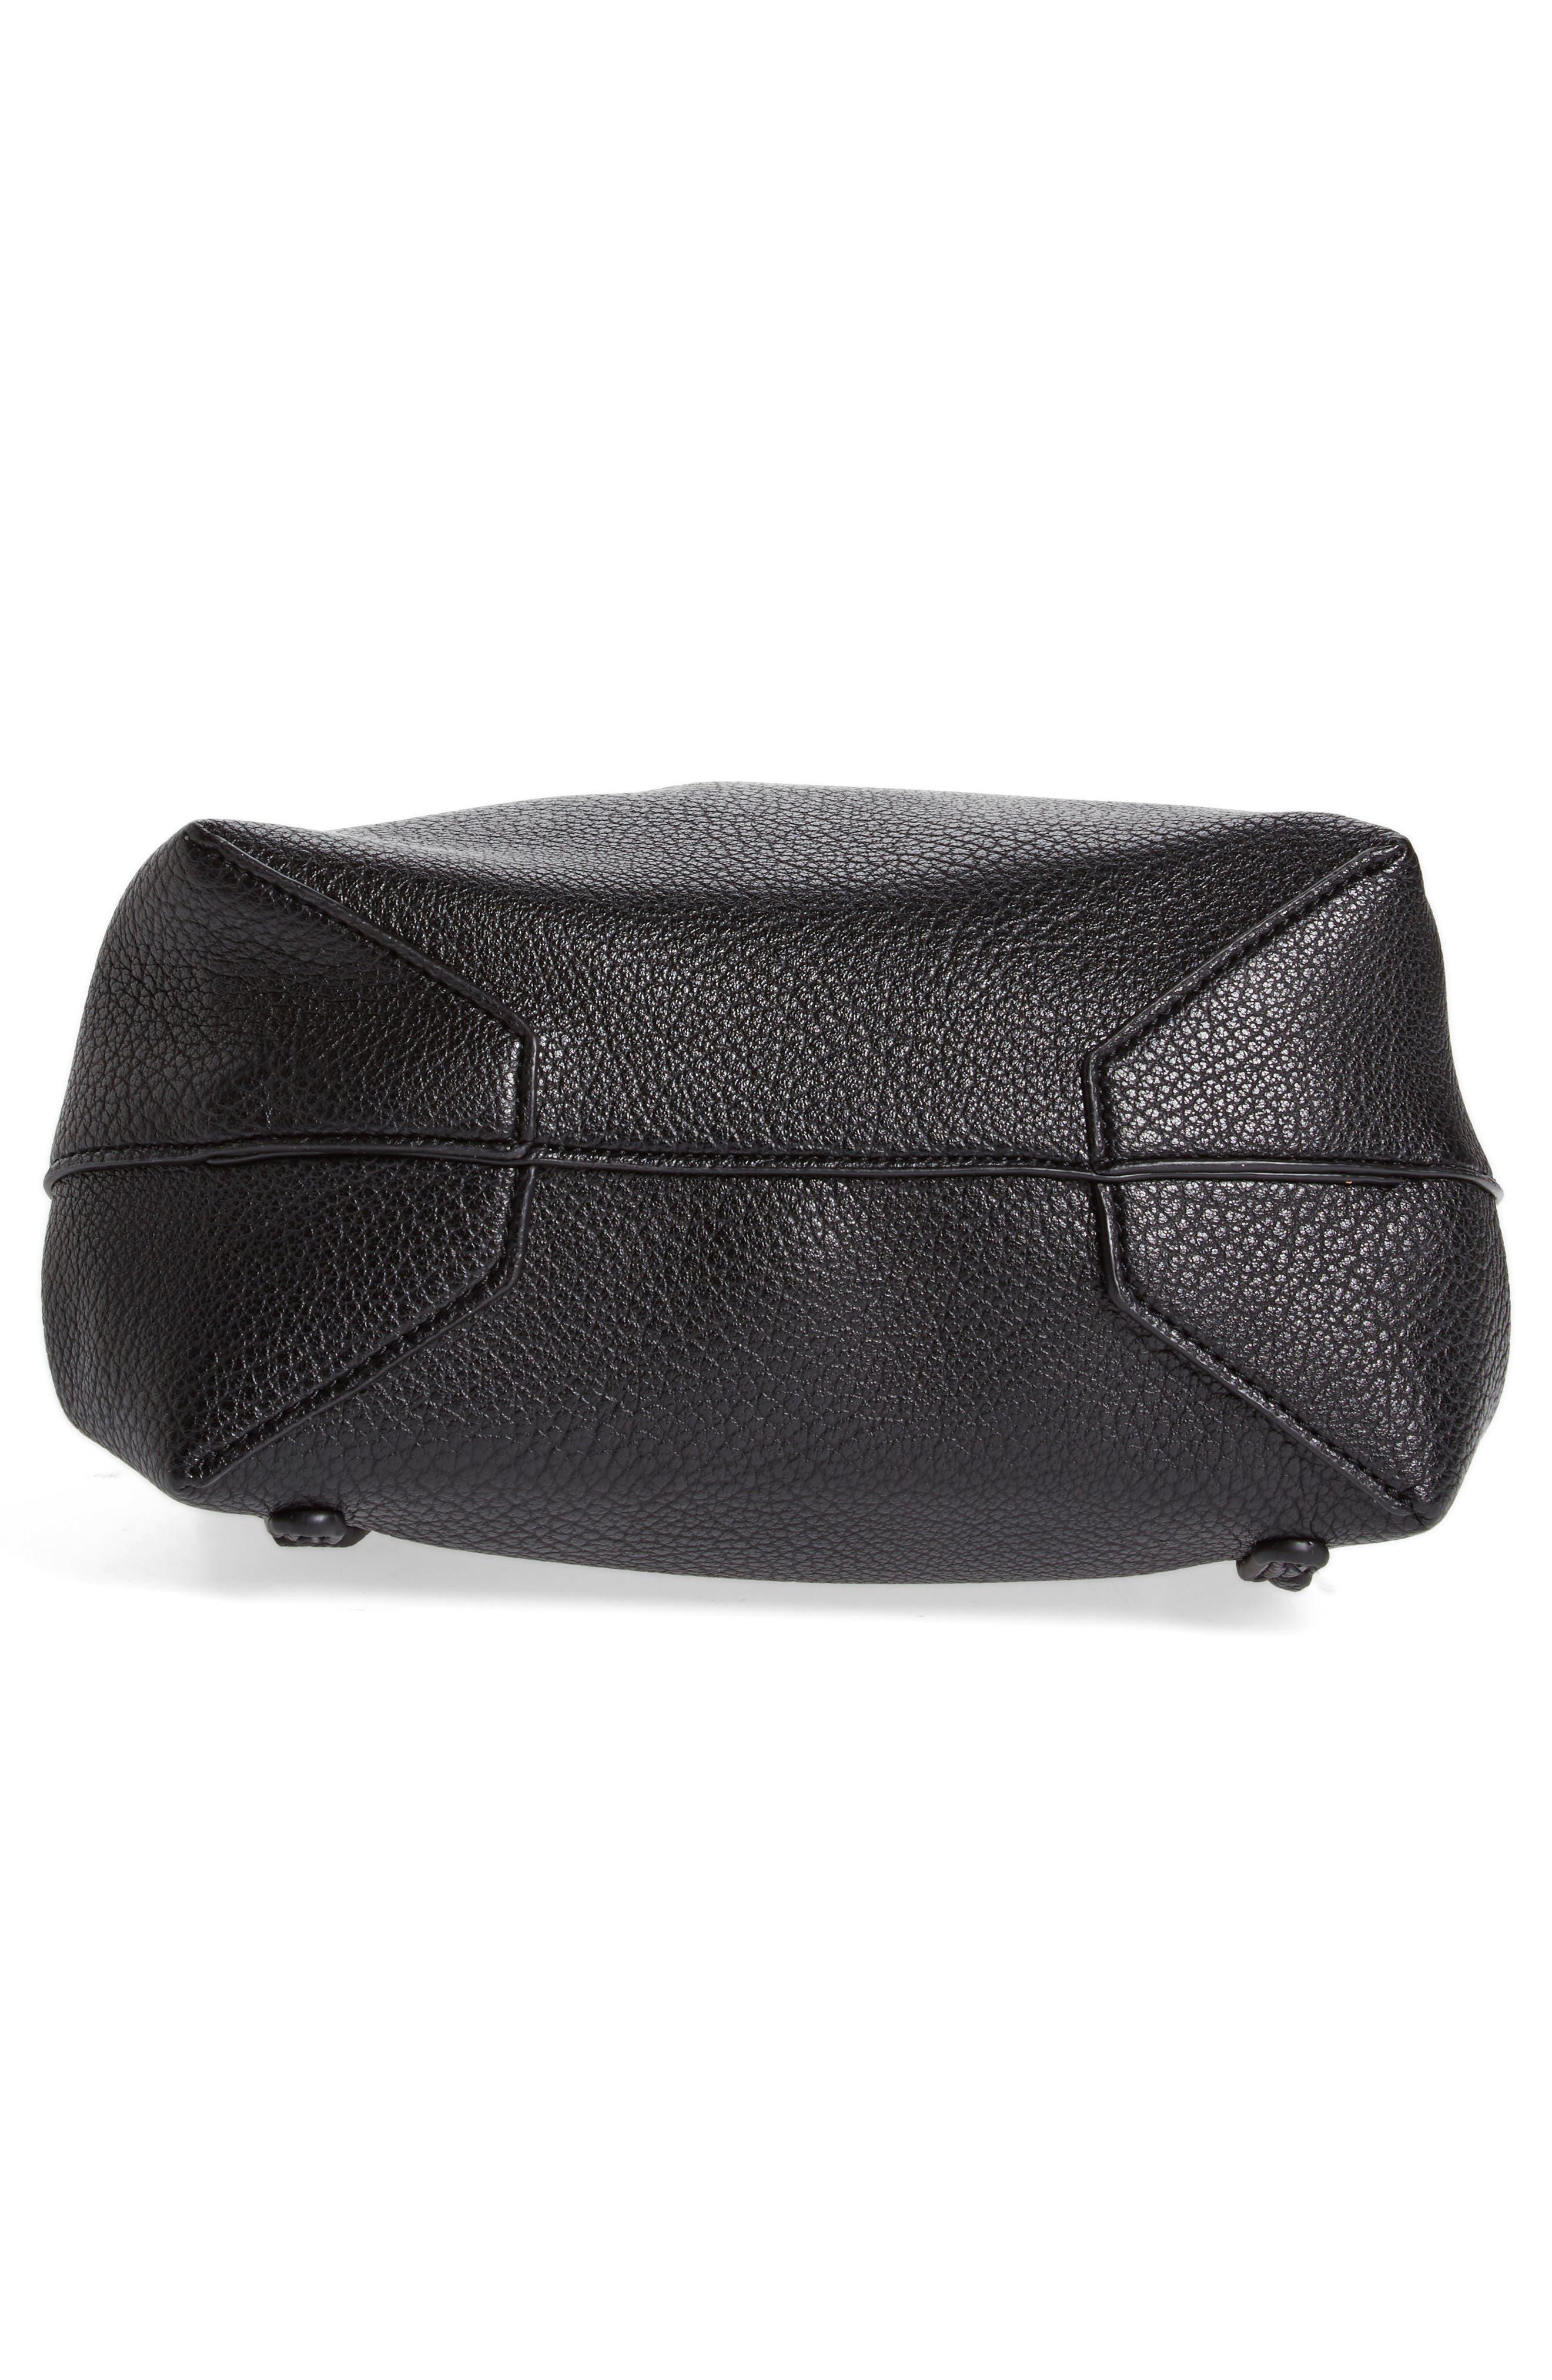 Jaylee Faux Leather Mini Backpack,                             Alternate thumbnail 6, color,                             Black